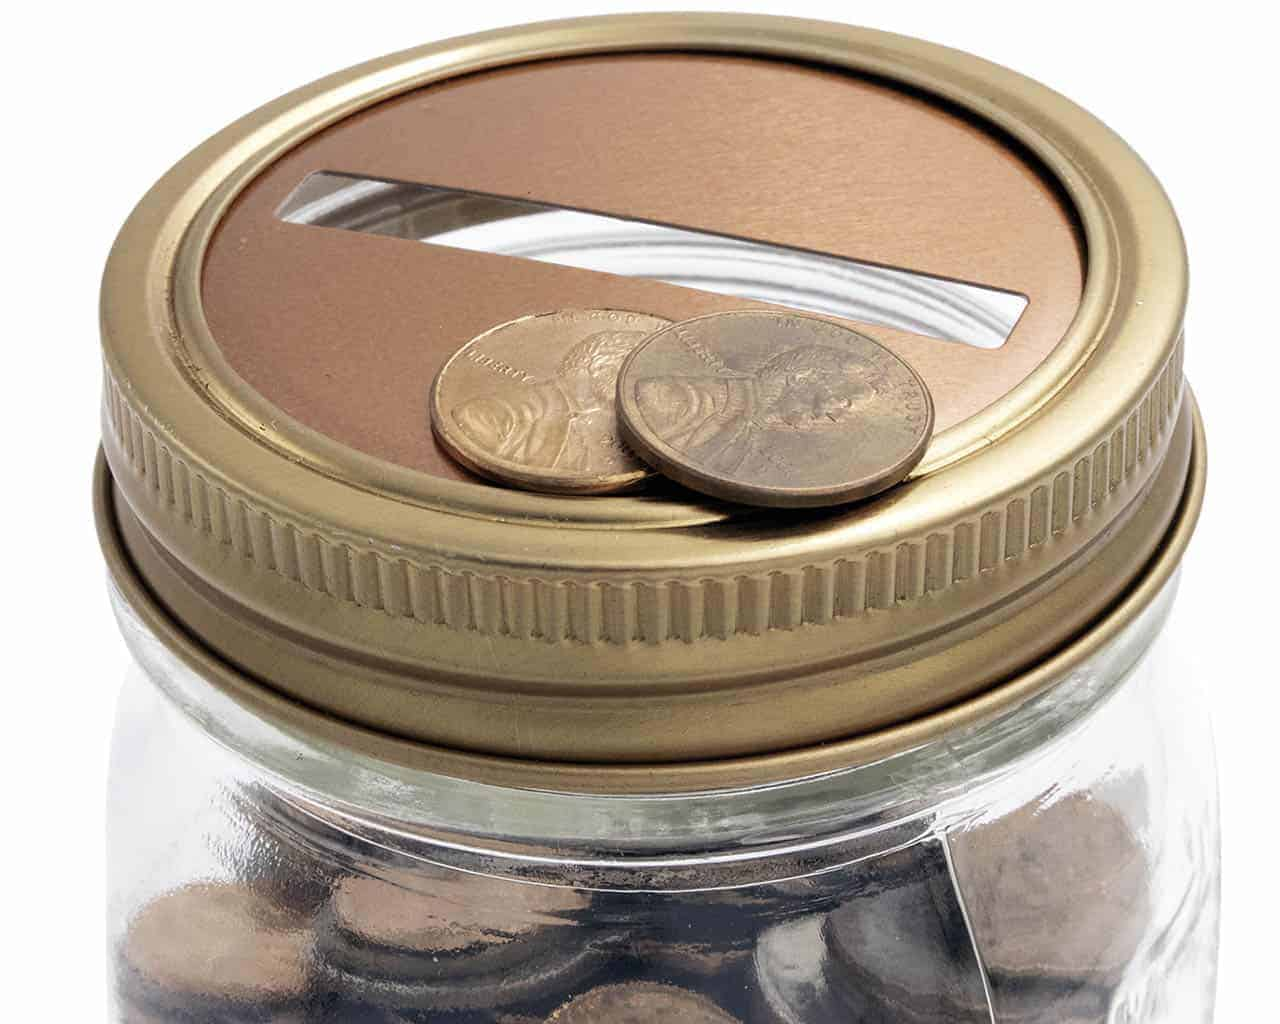 mason-jar-lifestyle-copper-coin-slot-bank-lid-insert-copper-band-regular-mouth-ball-mason-jar-pennies